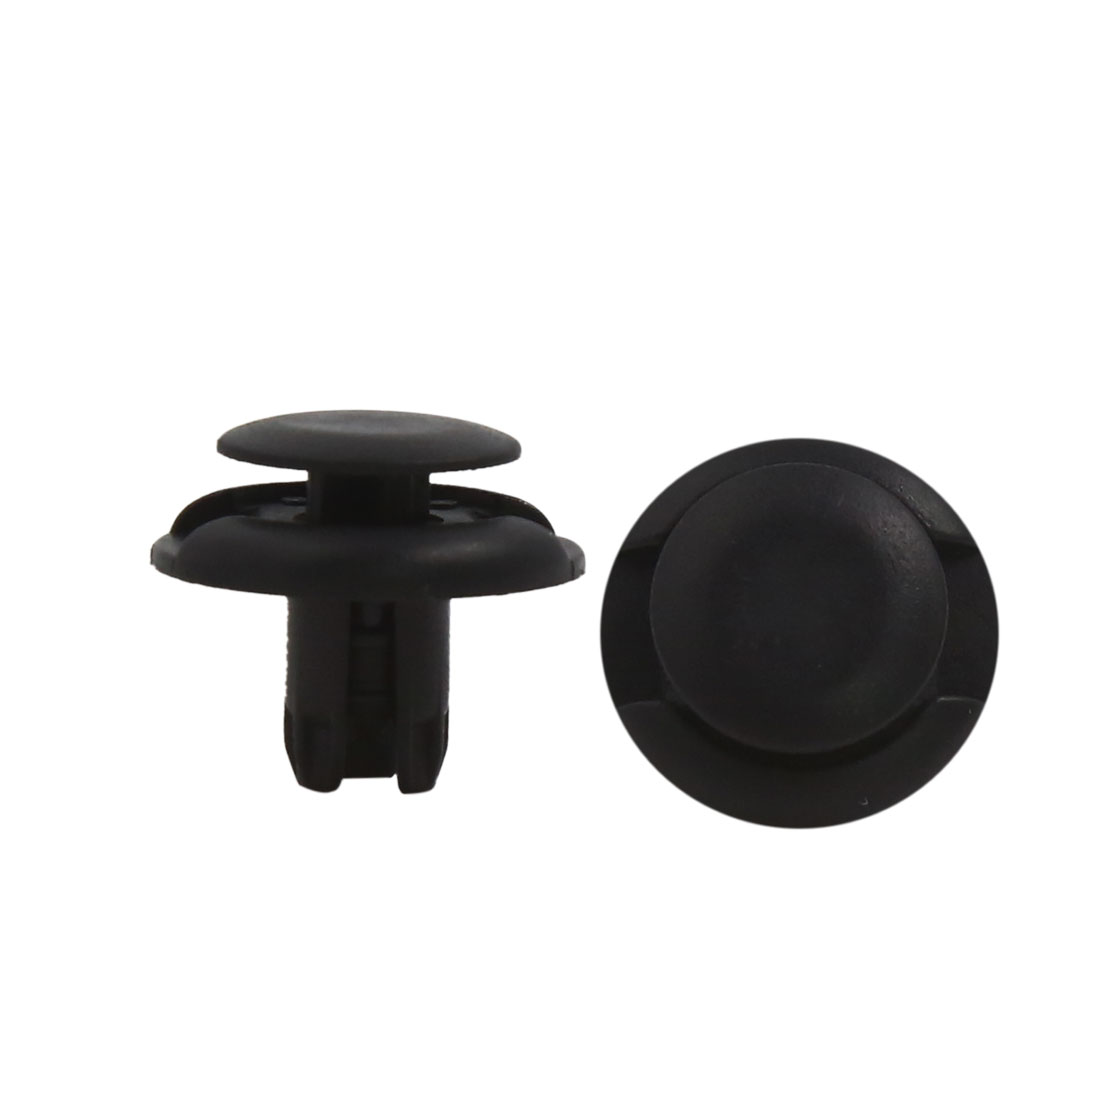 50Pcs Black Plastic Rivets Push Pin Arch Moulding Clips Fastener Retainer 8mm